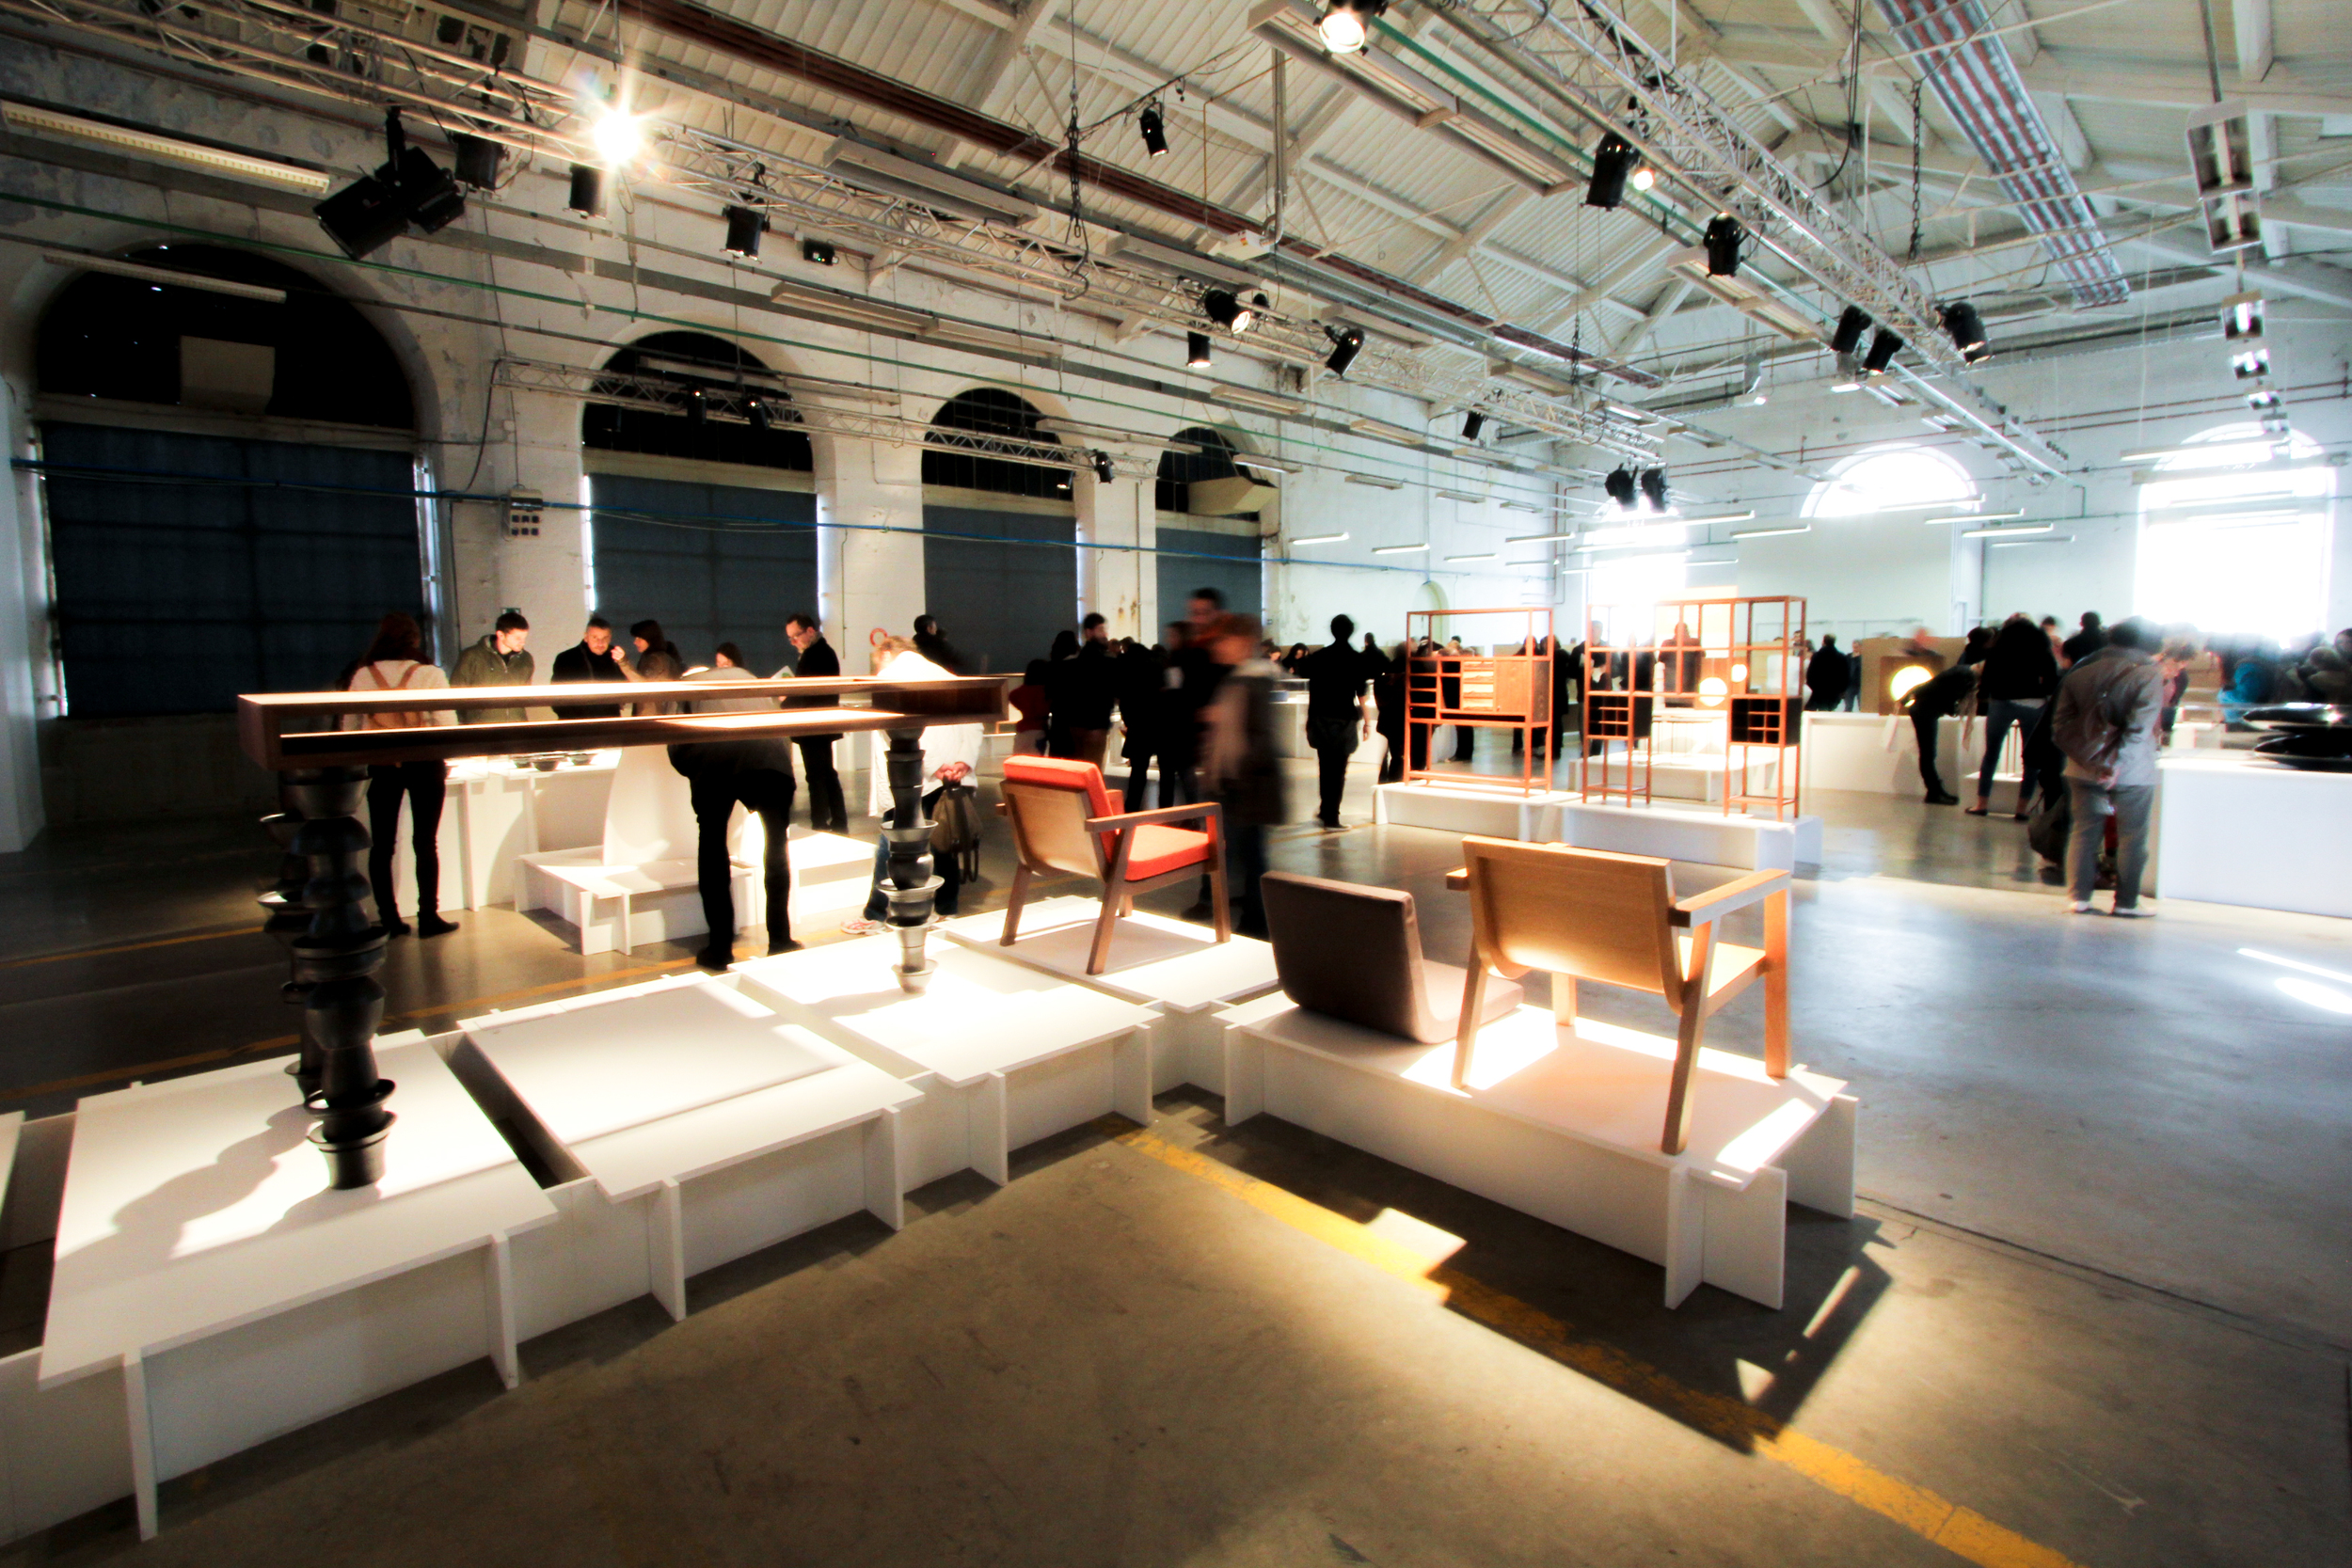 Futurecrafter_BiennaleSaintEtienne (12 of 35).jpg